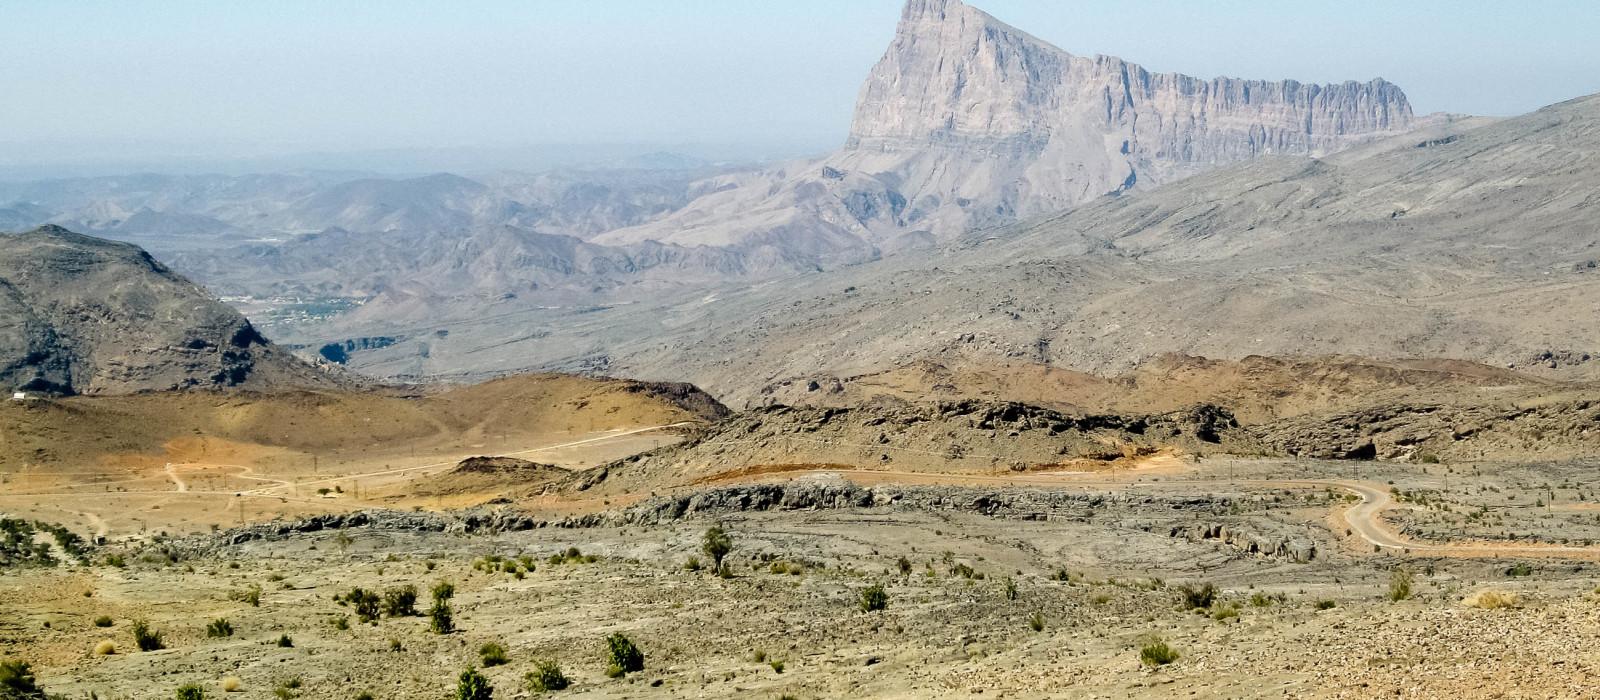 Reiseziel Jebel Shams & Al Hamra Oman